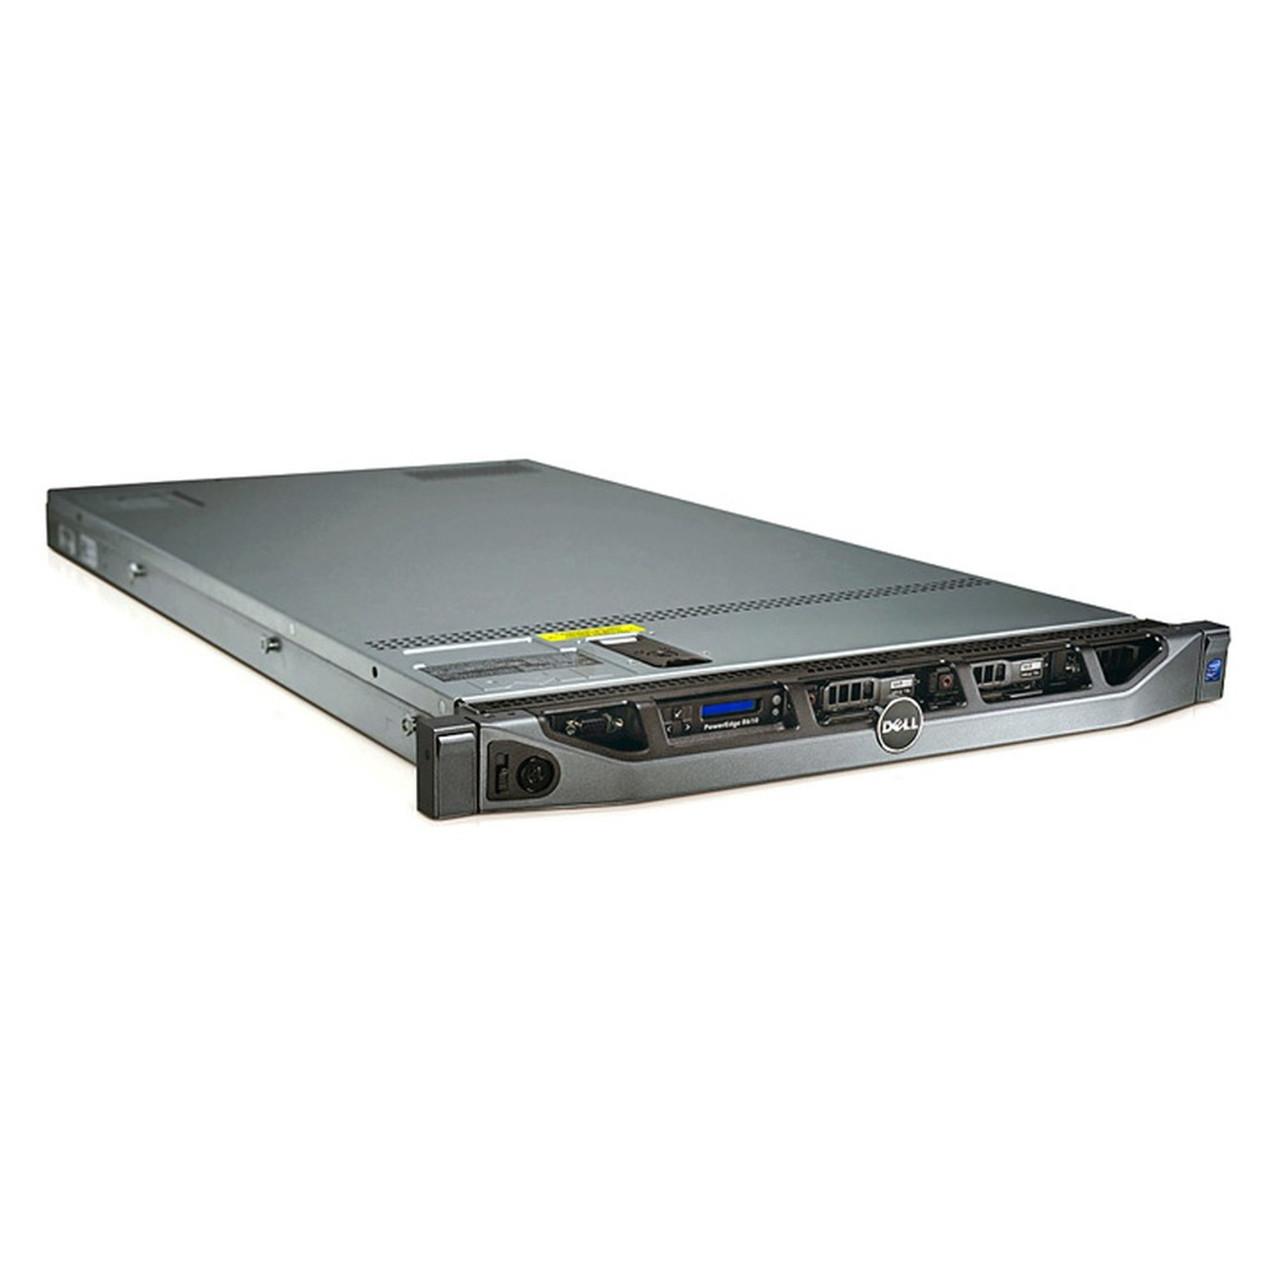 Dell PowerEdge R710 2.5 Server 2x E5520 2.26GHz Quad Core PERC6 Build Your Own